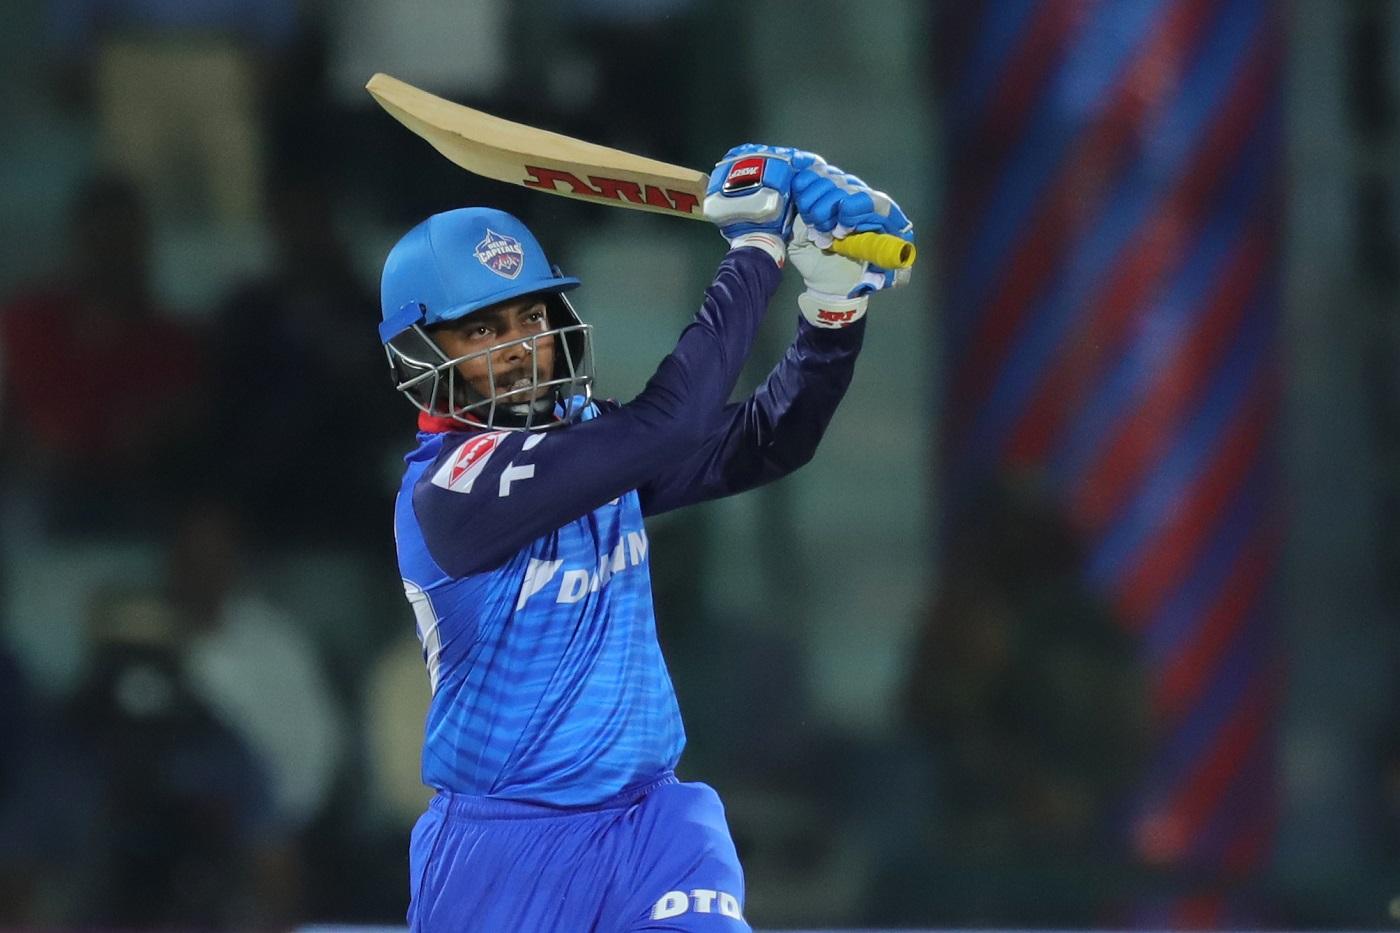 भारतीय टीम को मिला नया 'हिटमैन', जल्द भारतीय टीम में लेगा रोहित शर्मा की जगह 3